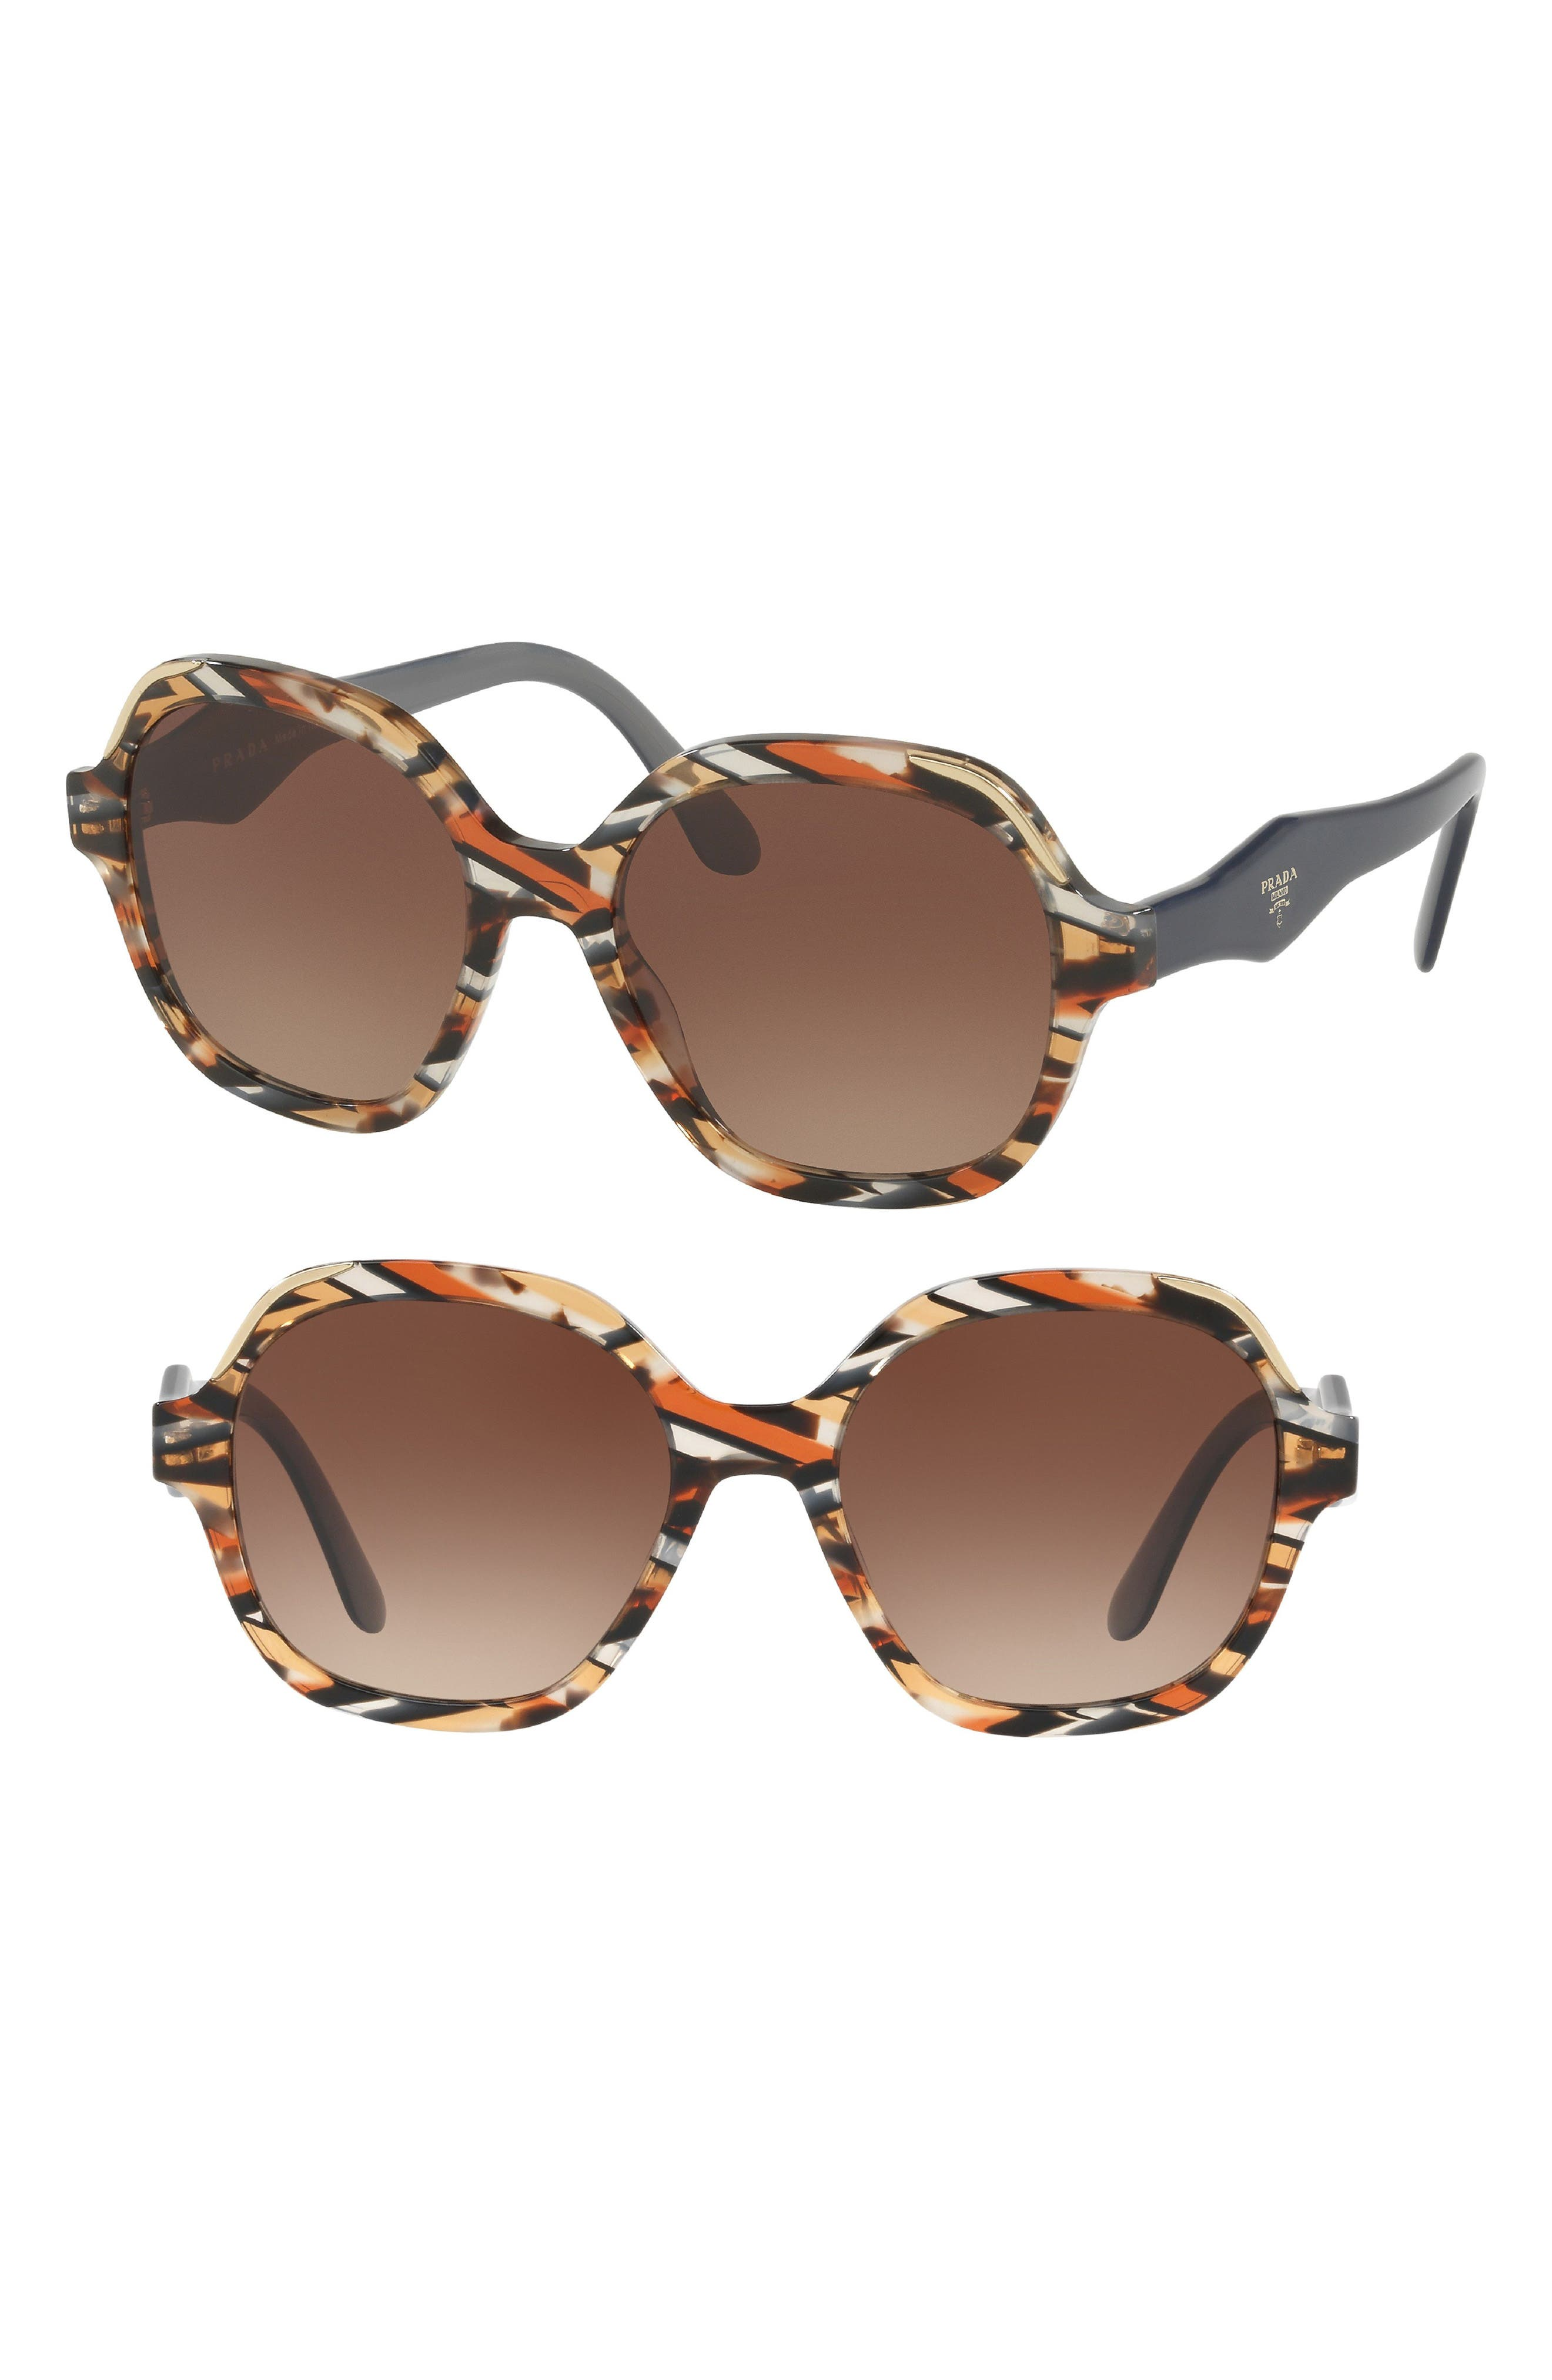 52mm Geometric Gradient Sunglasses,                             Alternate thumbnail 4, color,